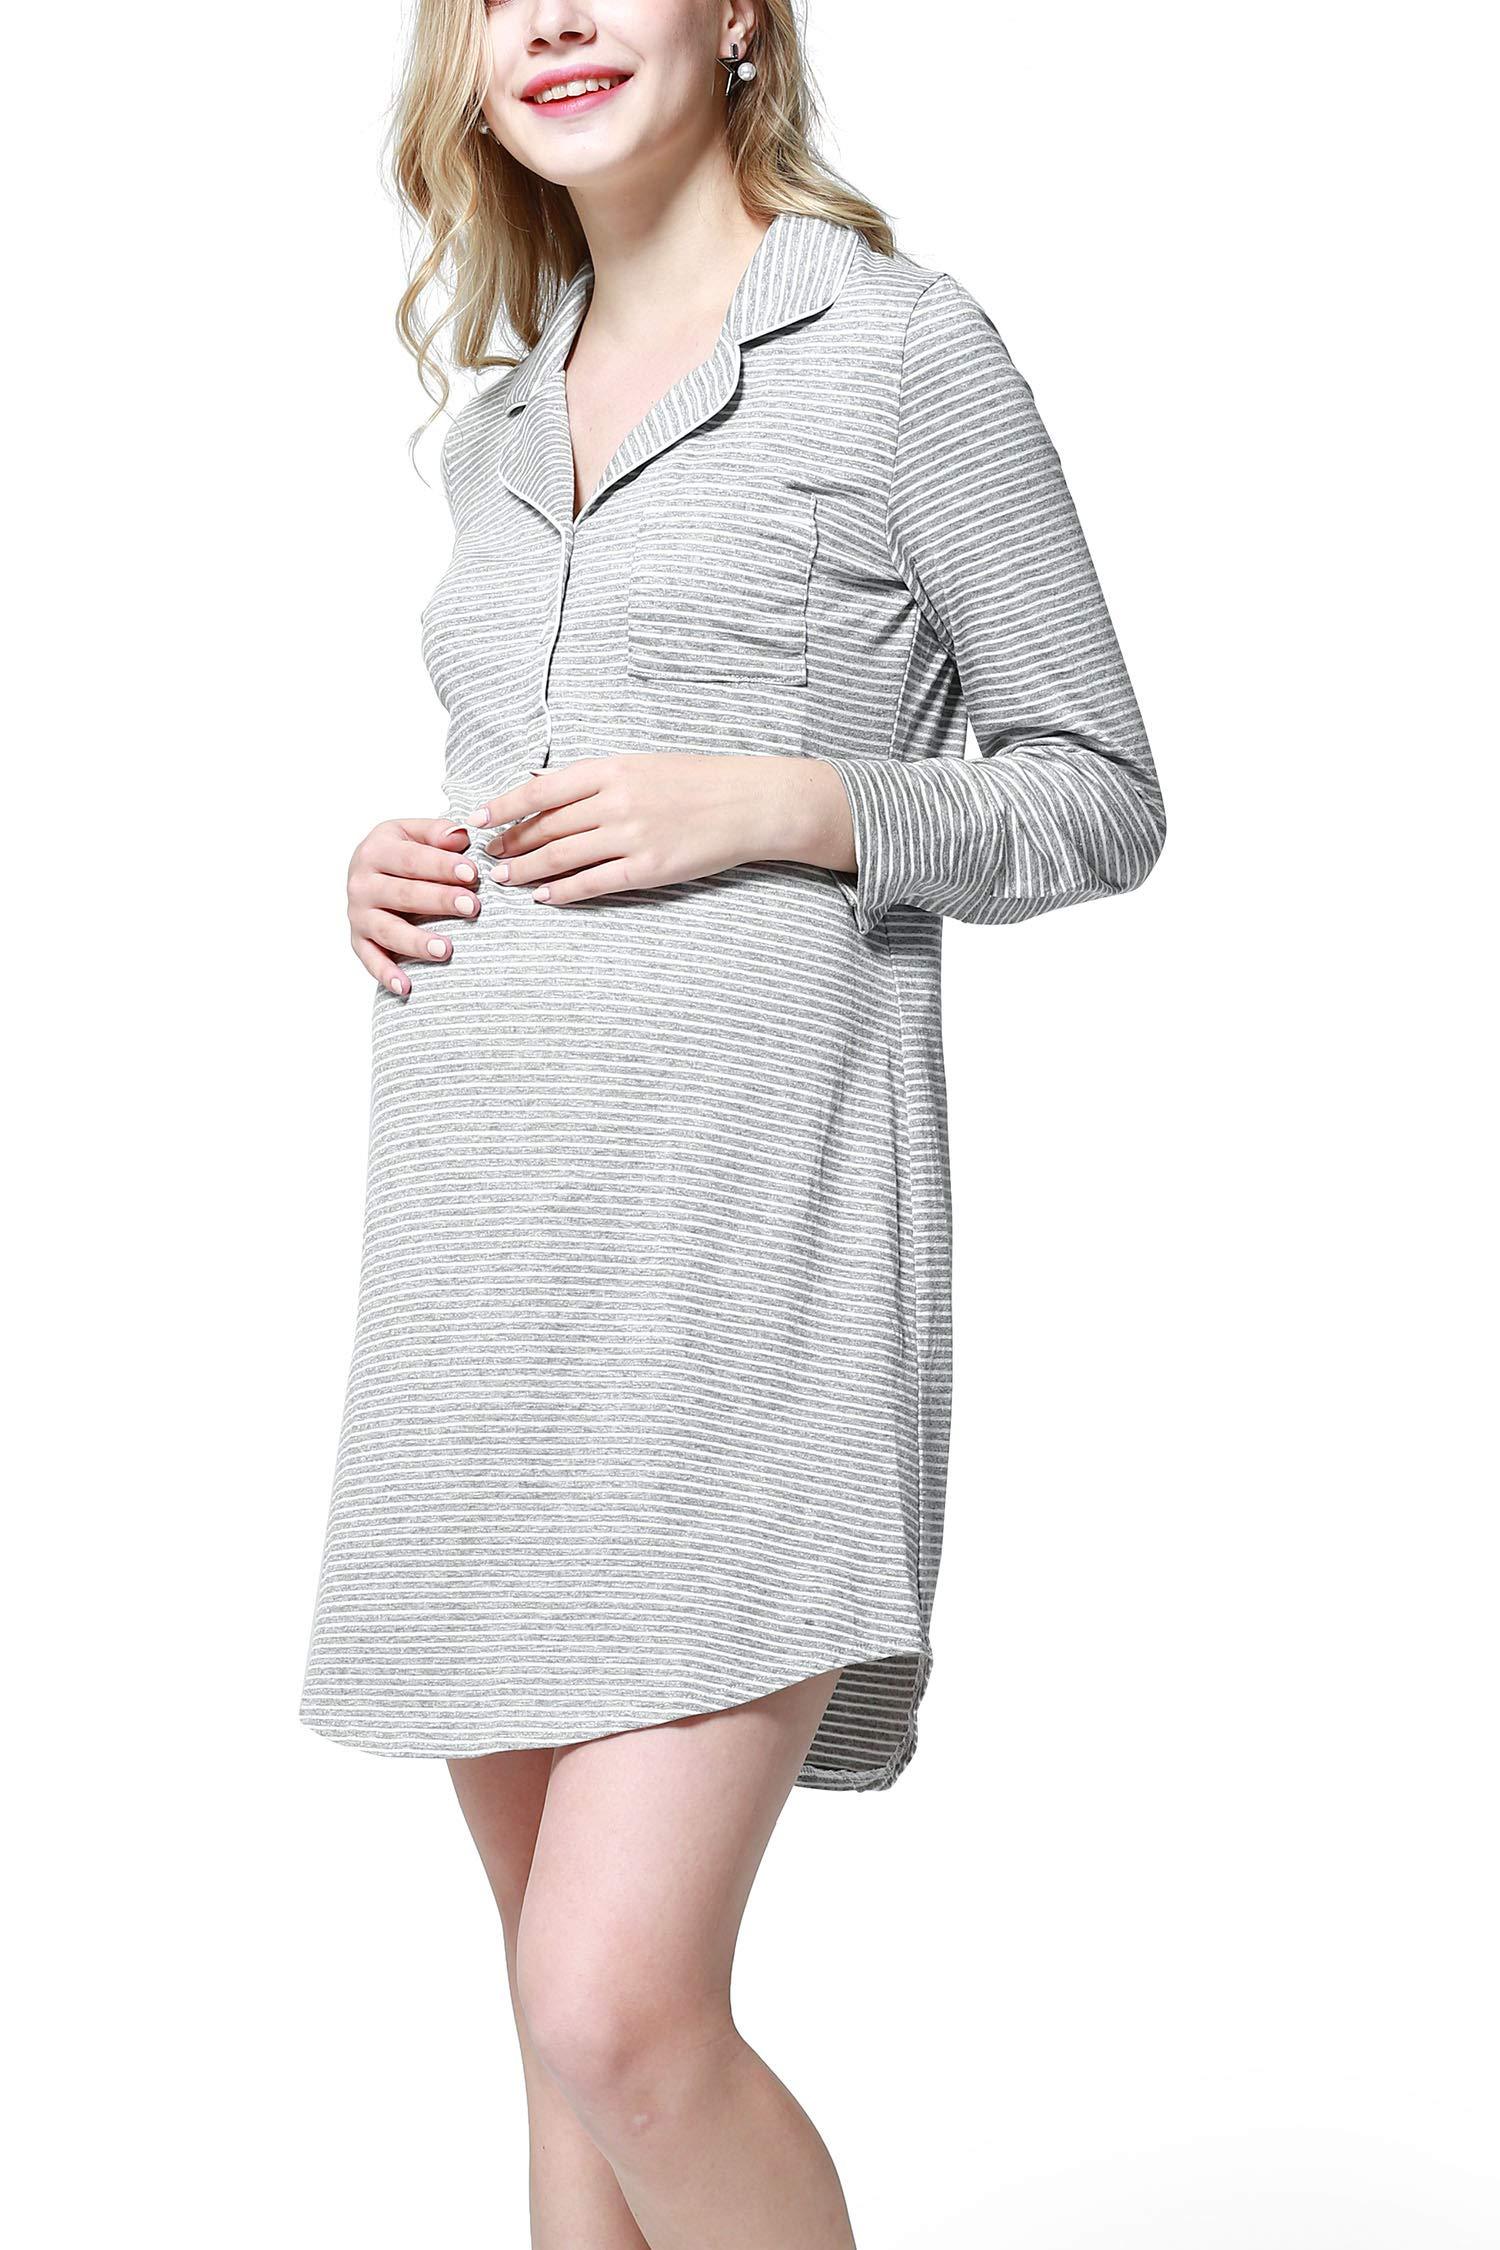 Dance Fairy Molliya Women's Maternity Dress Stripes Nursing Nightgown Breastfeeding,Lapel Collar Pajamas (Gray, M)